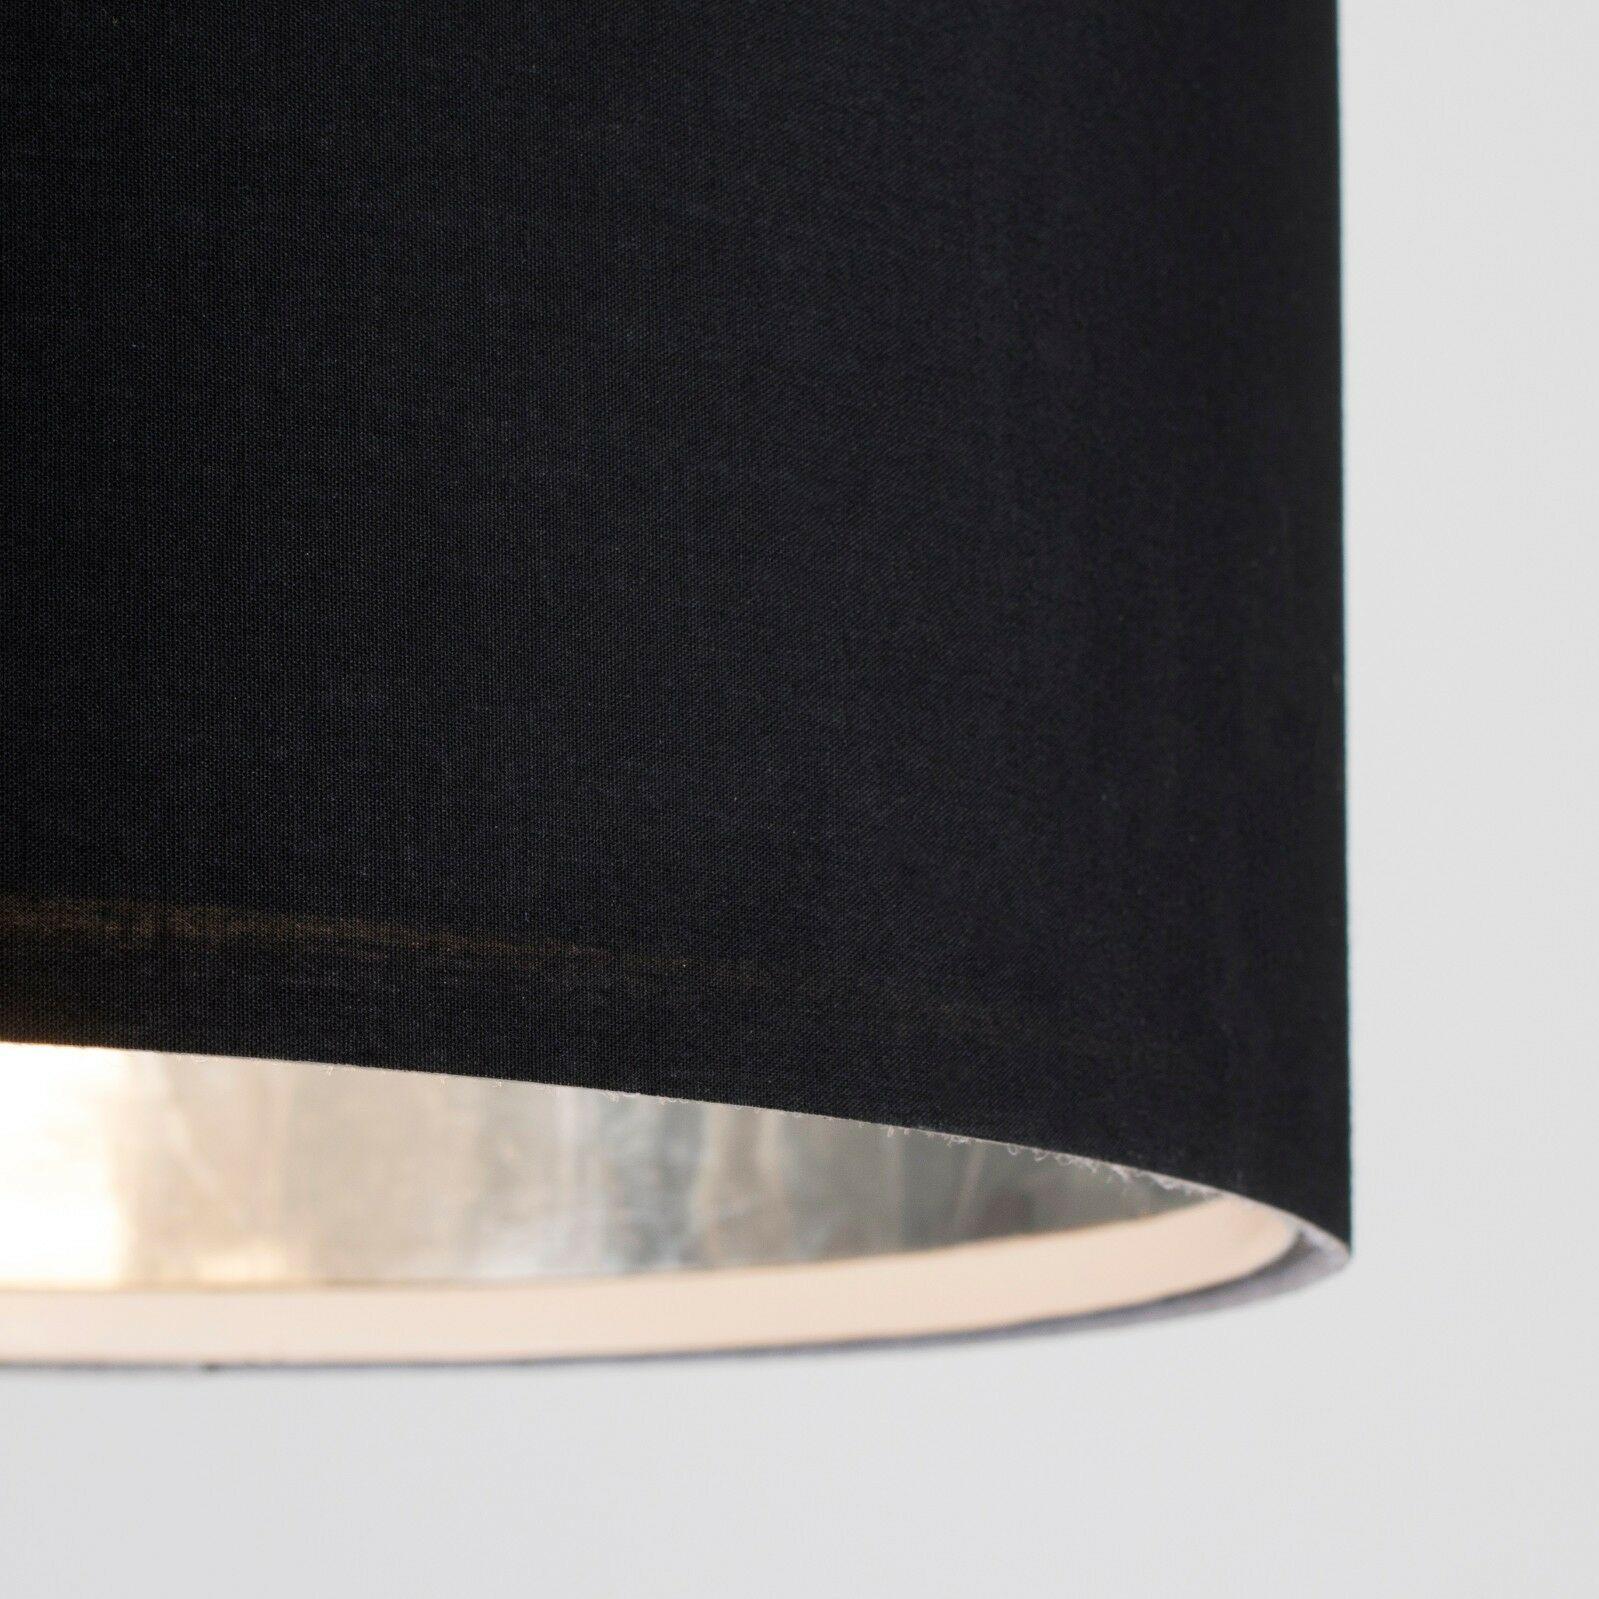 Tela-moderna-algodon-facil-ajuste-Techo-Colgante-Pantalla-De-Mesa-tonos-de-luz-de-tambor miniatura 25